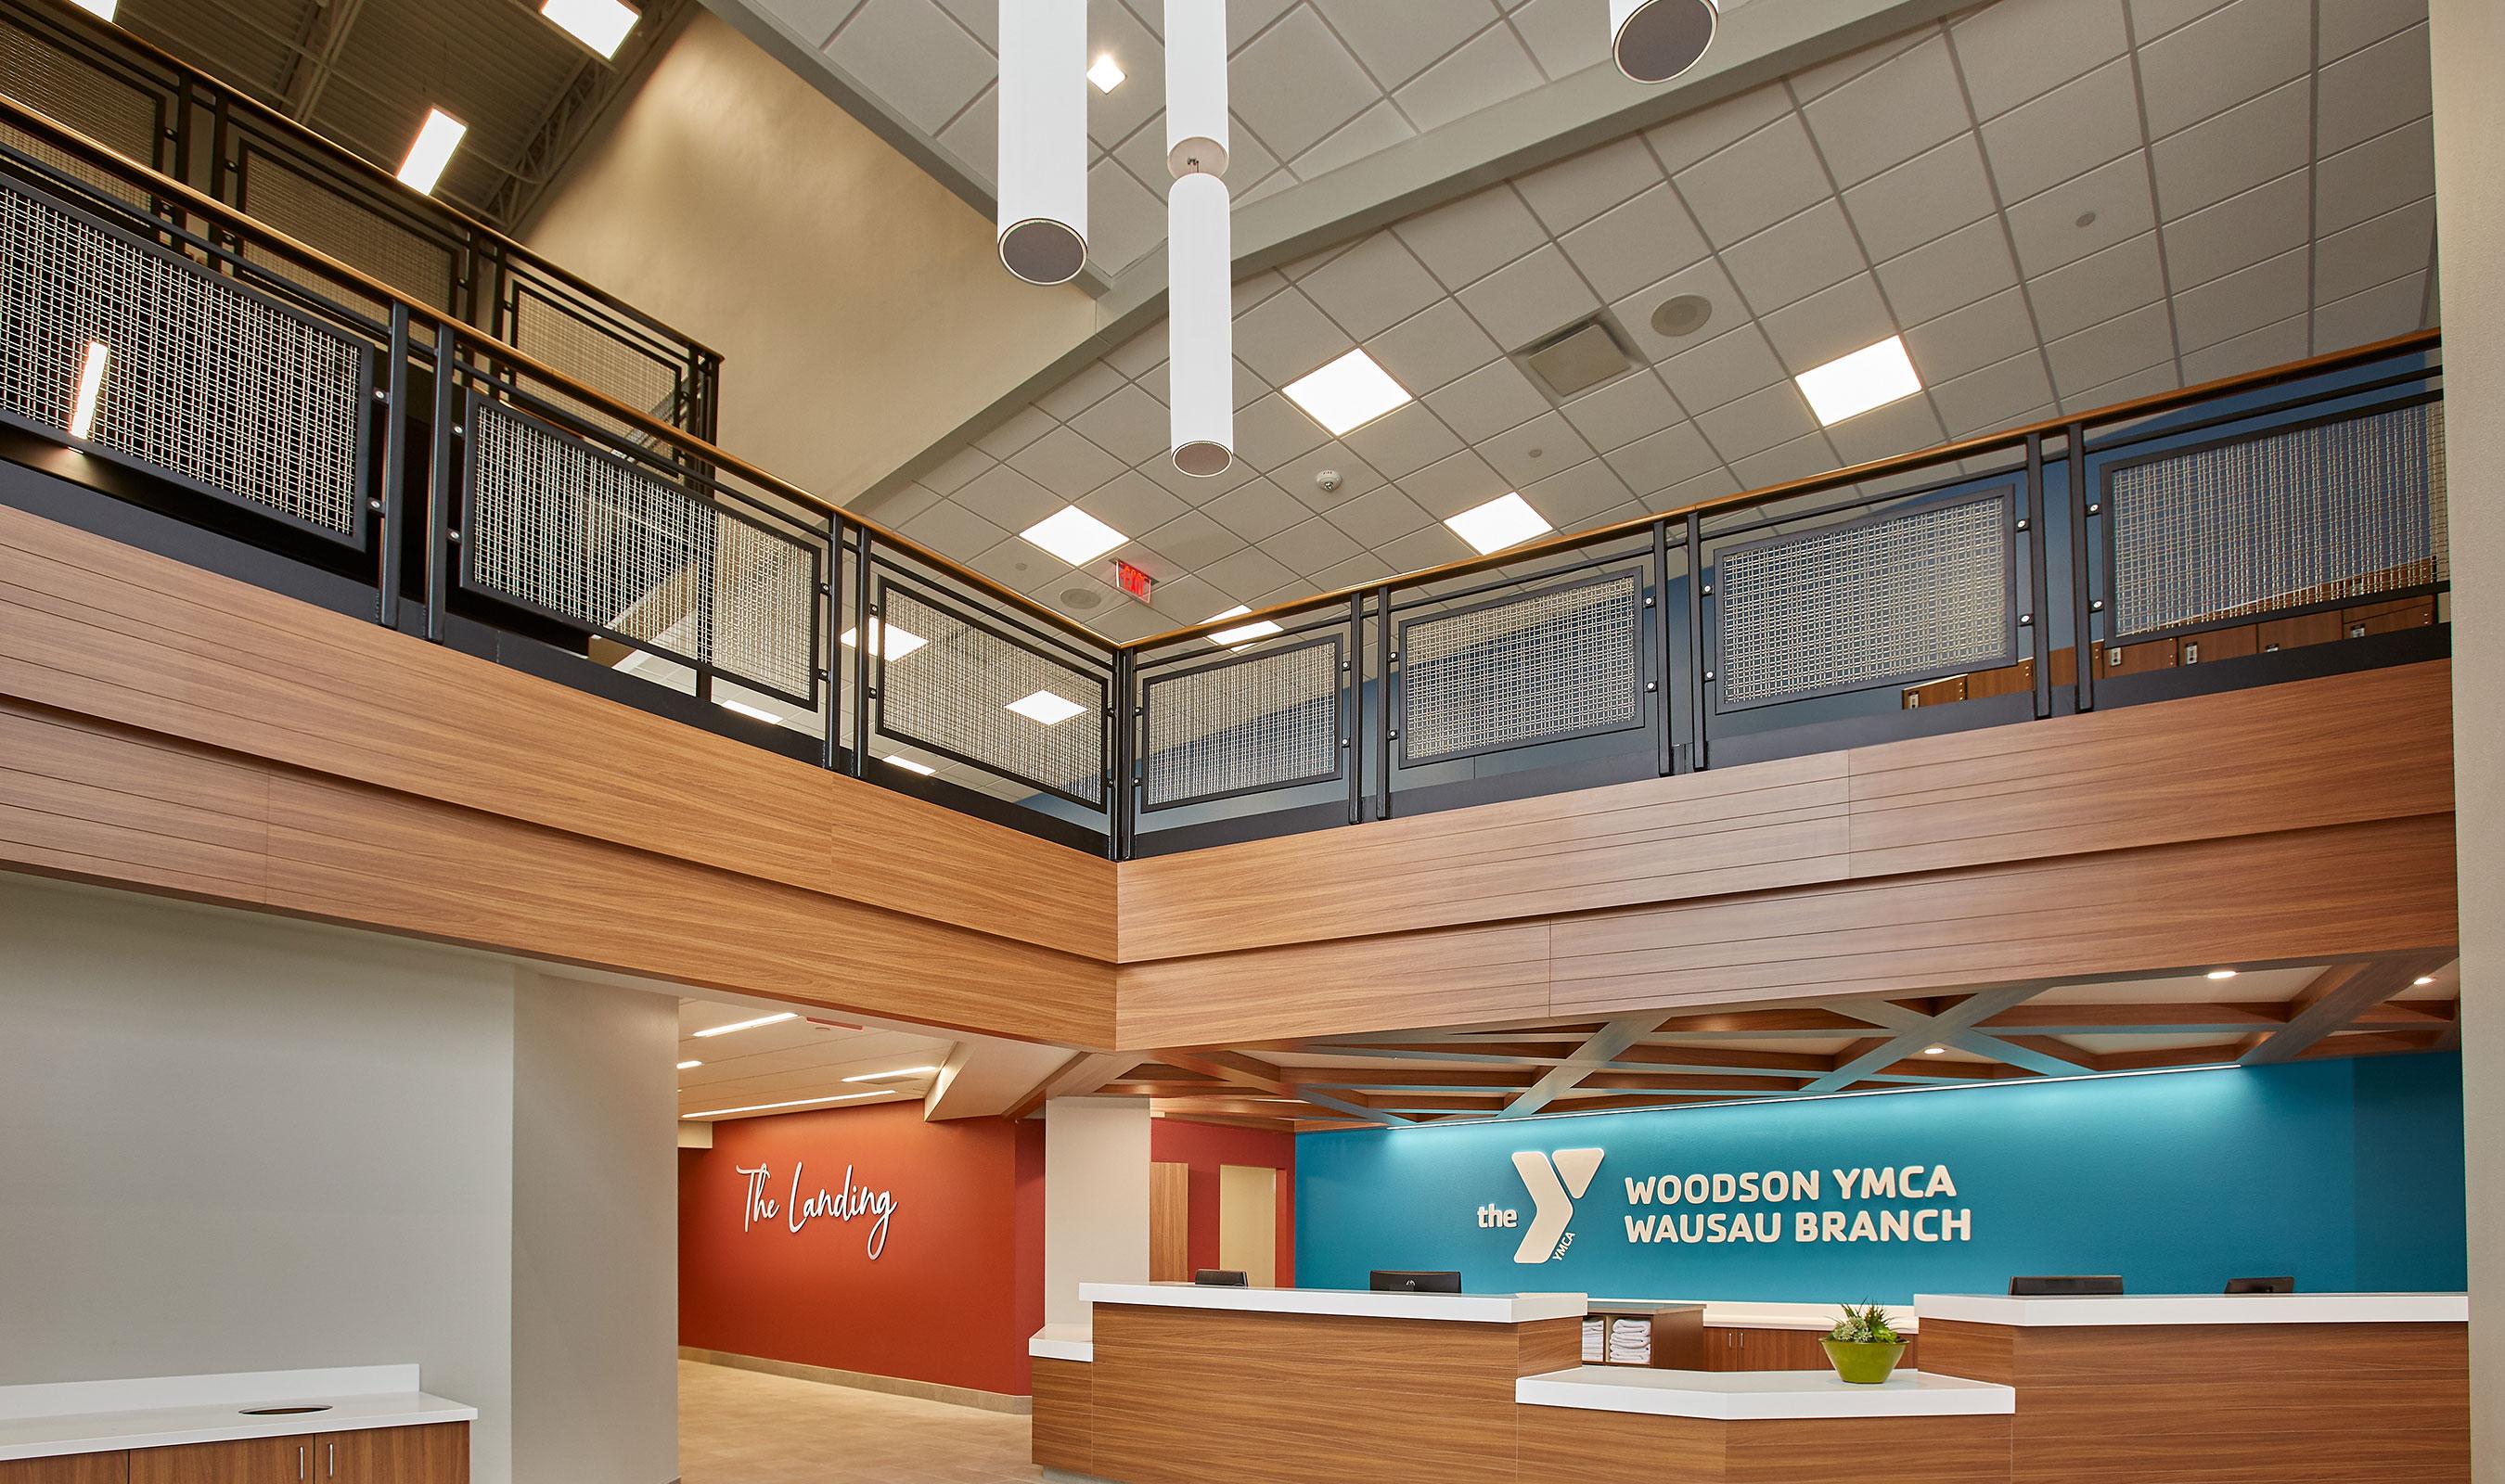 Woodson YMCA